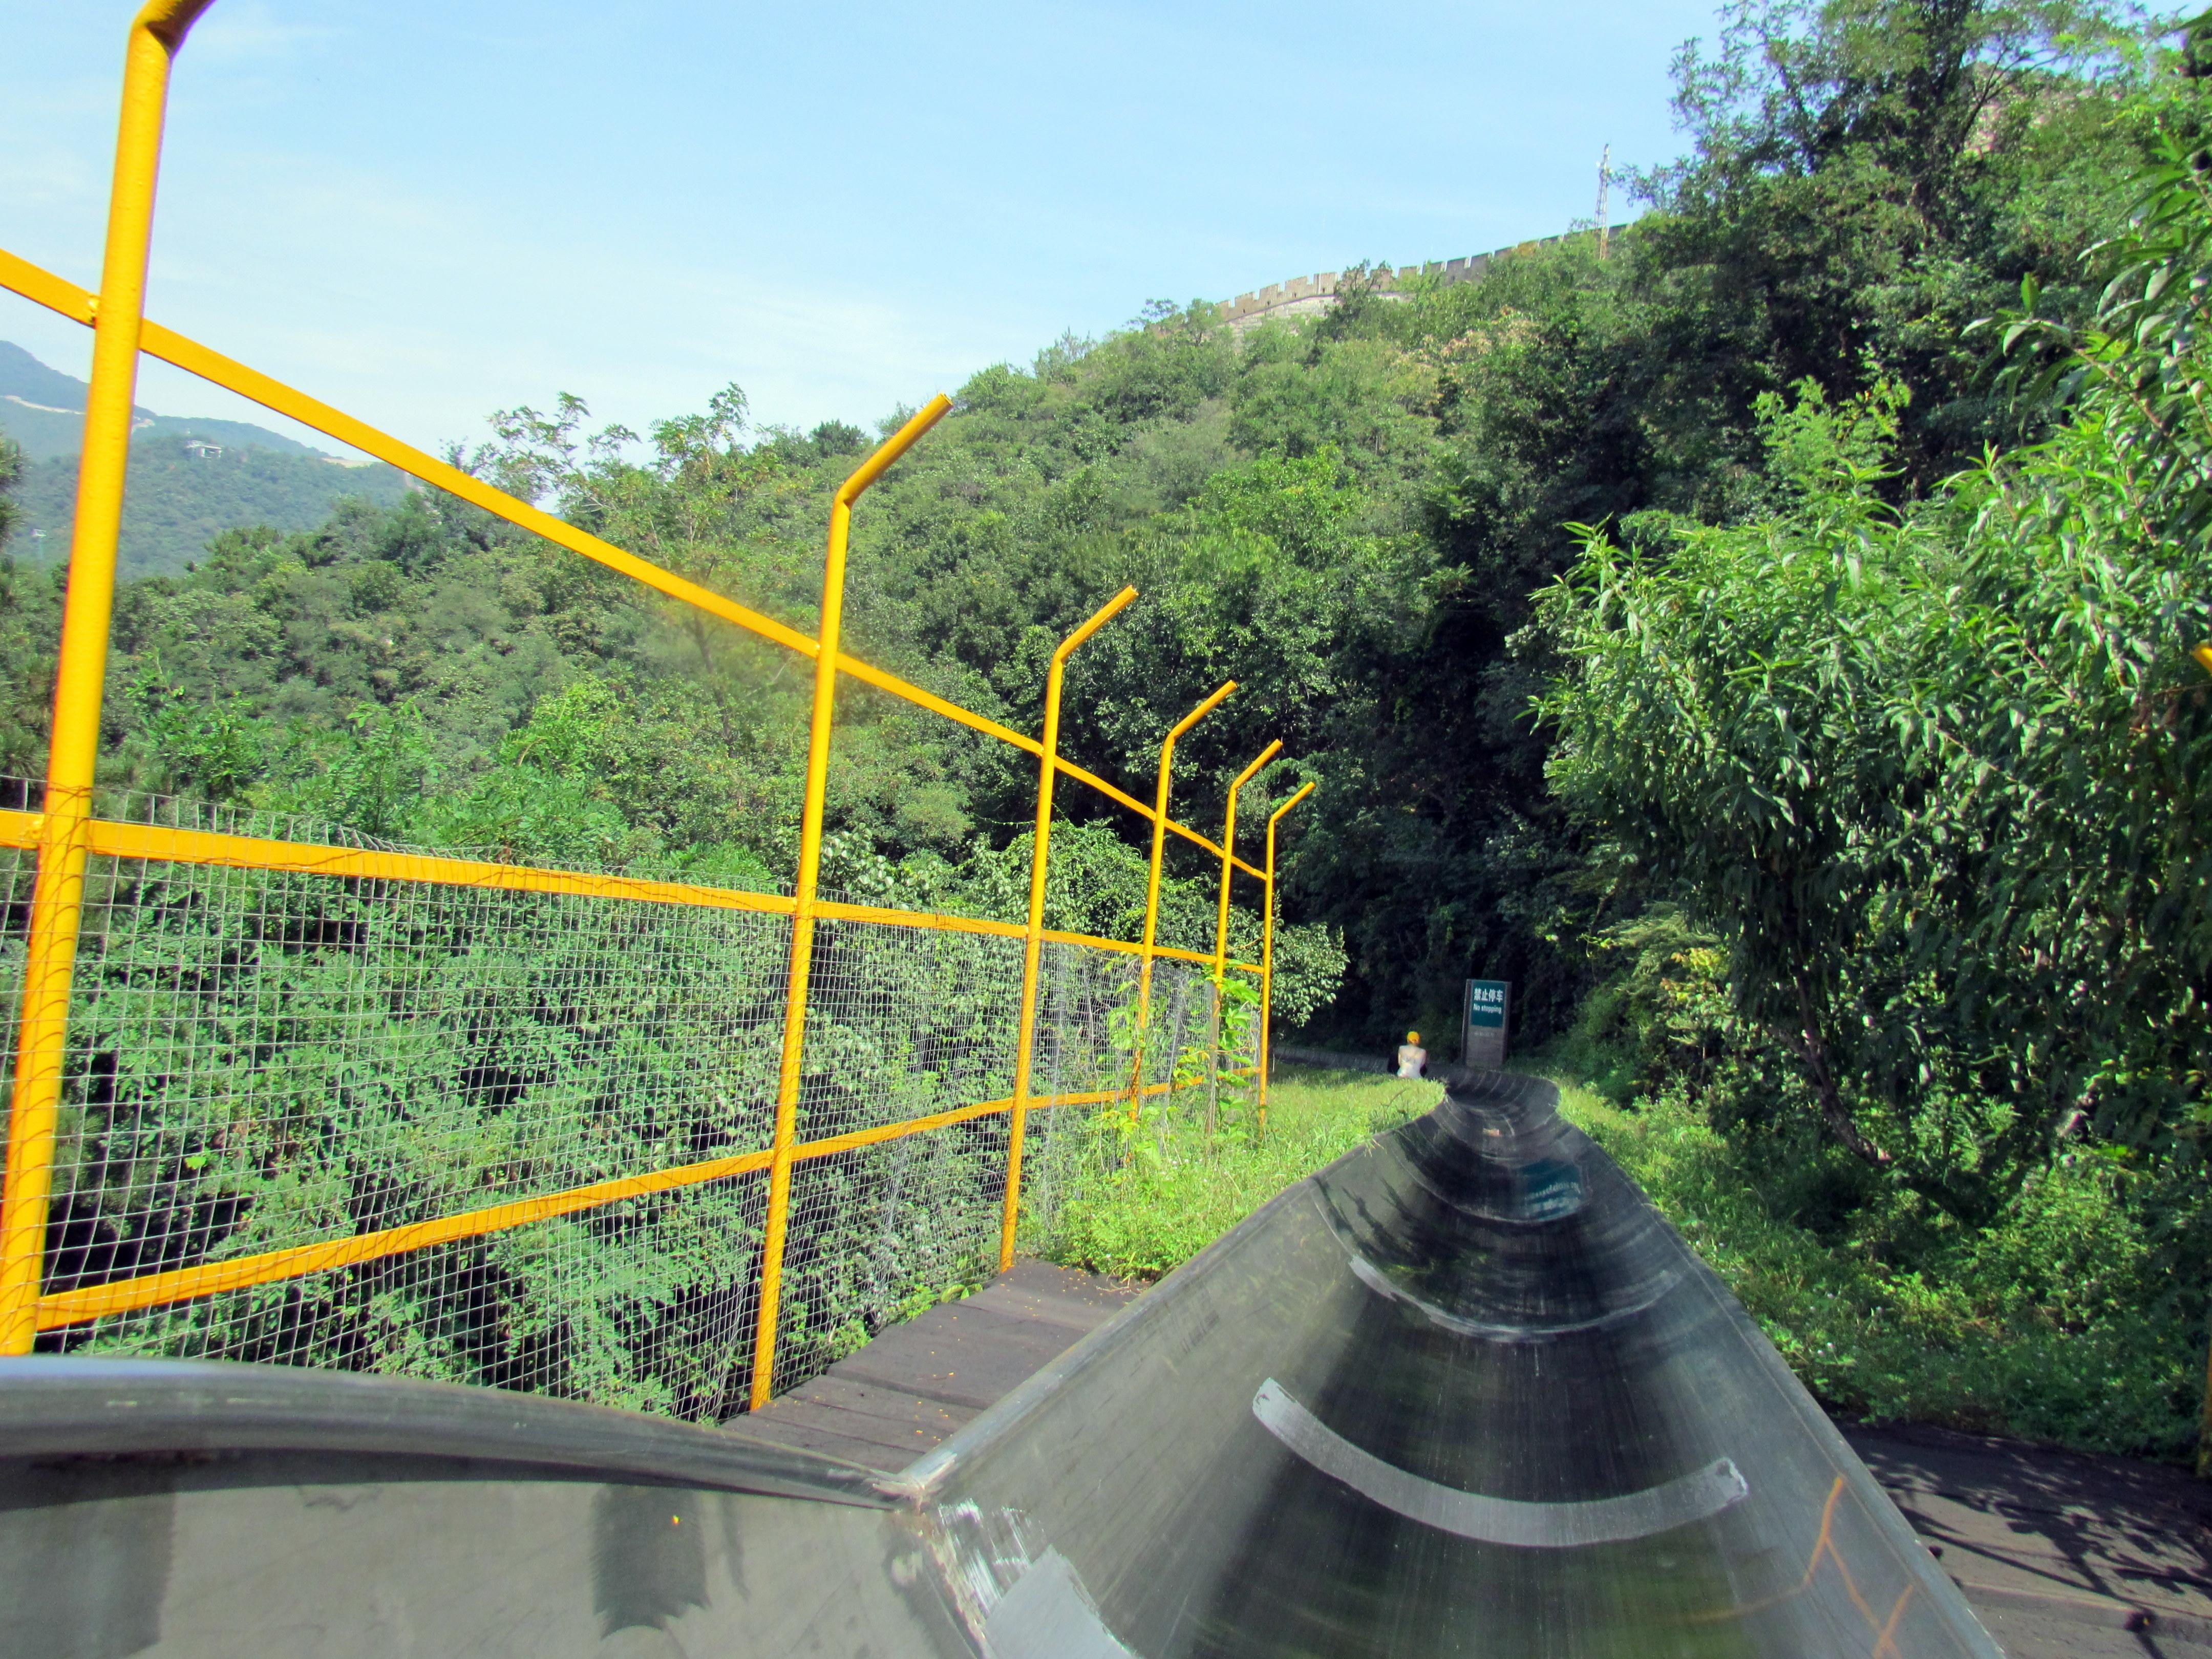 File Toboggan Ride At Mutianyu Section Of Great Wall Of